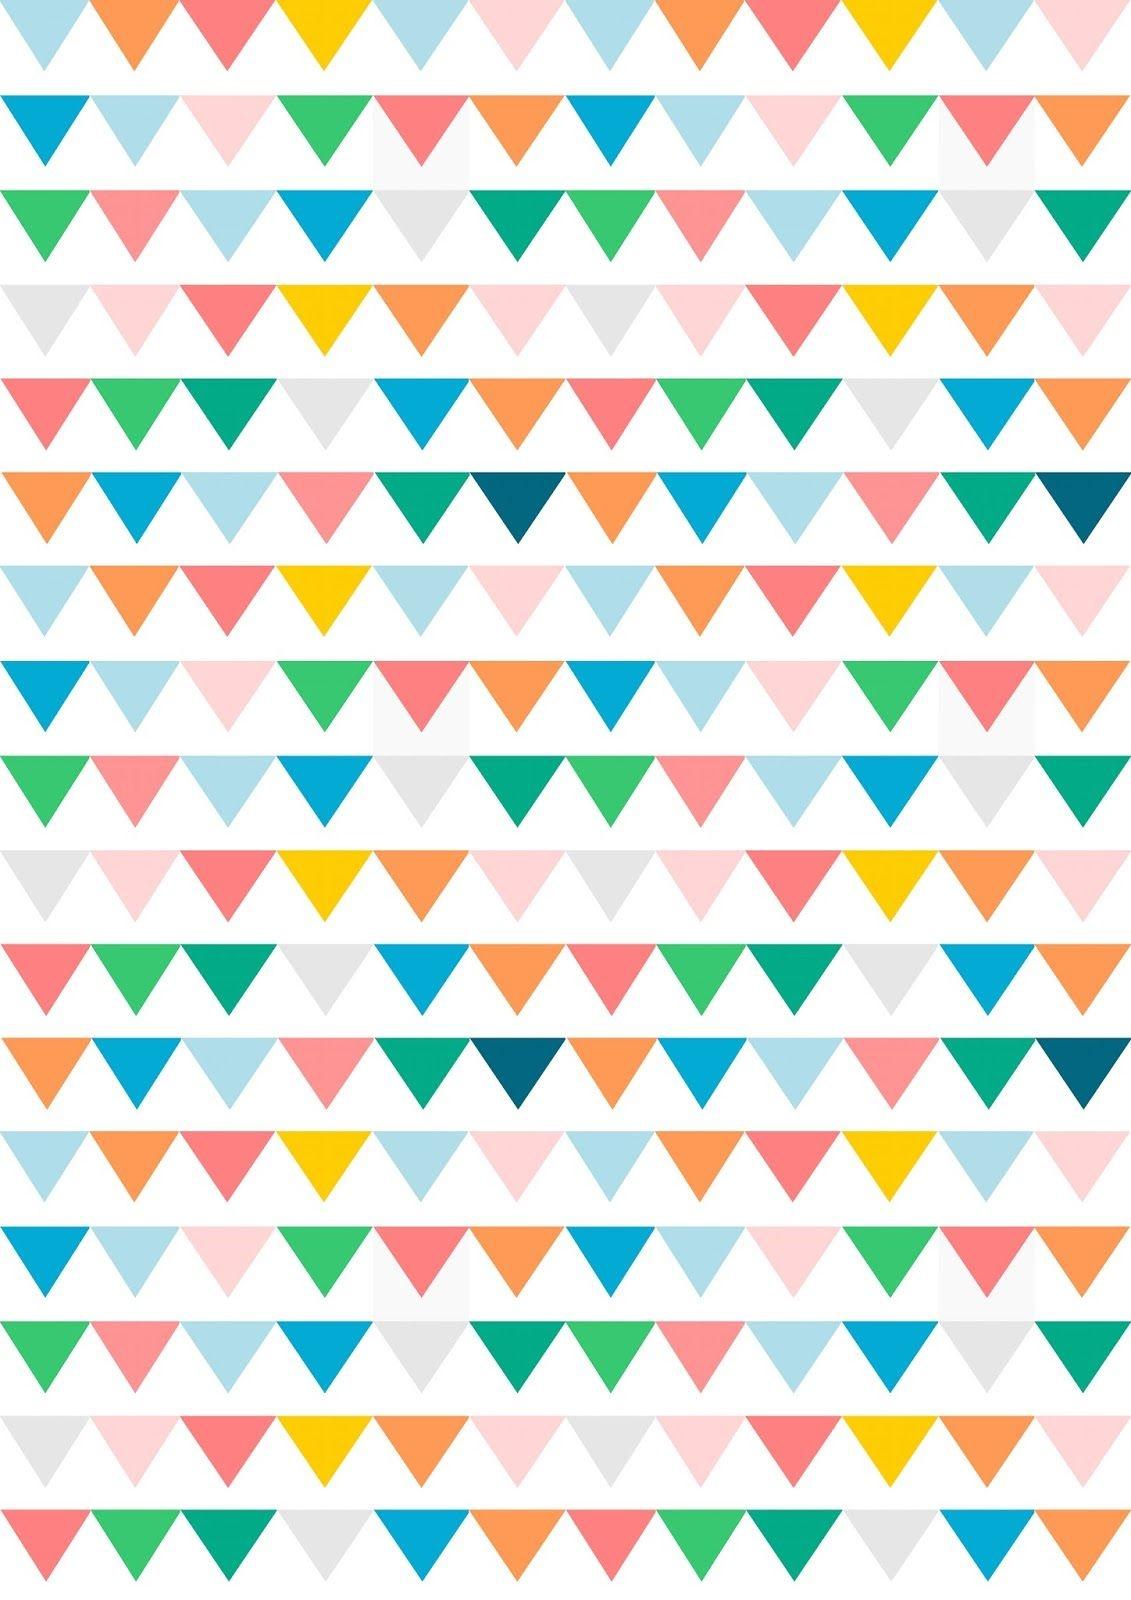 Free Digital Bunting Scrapbooking Paper - Ausdruckbares - Free Printable Paper